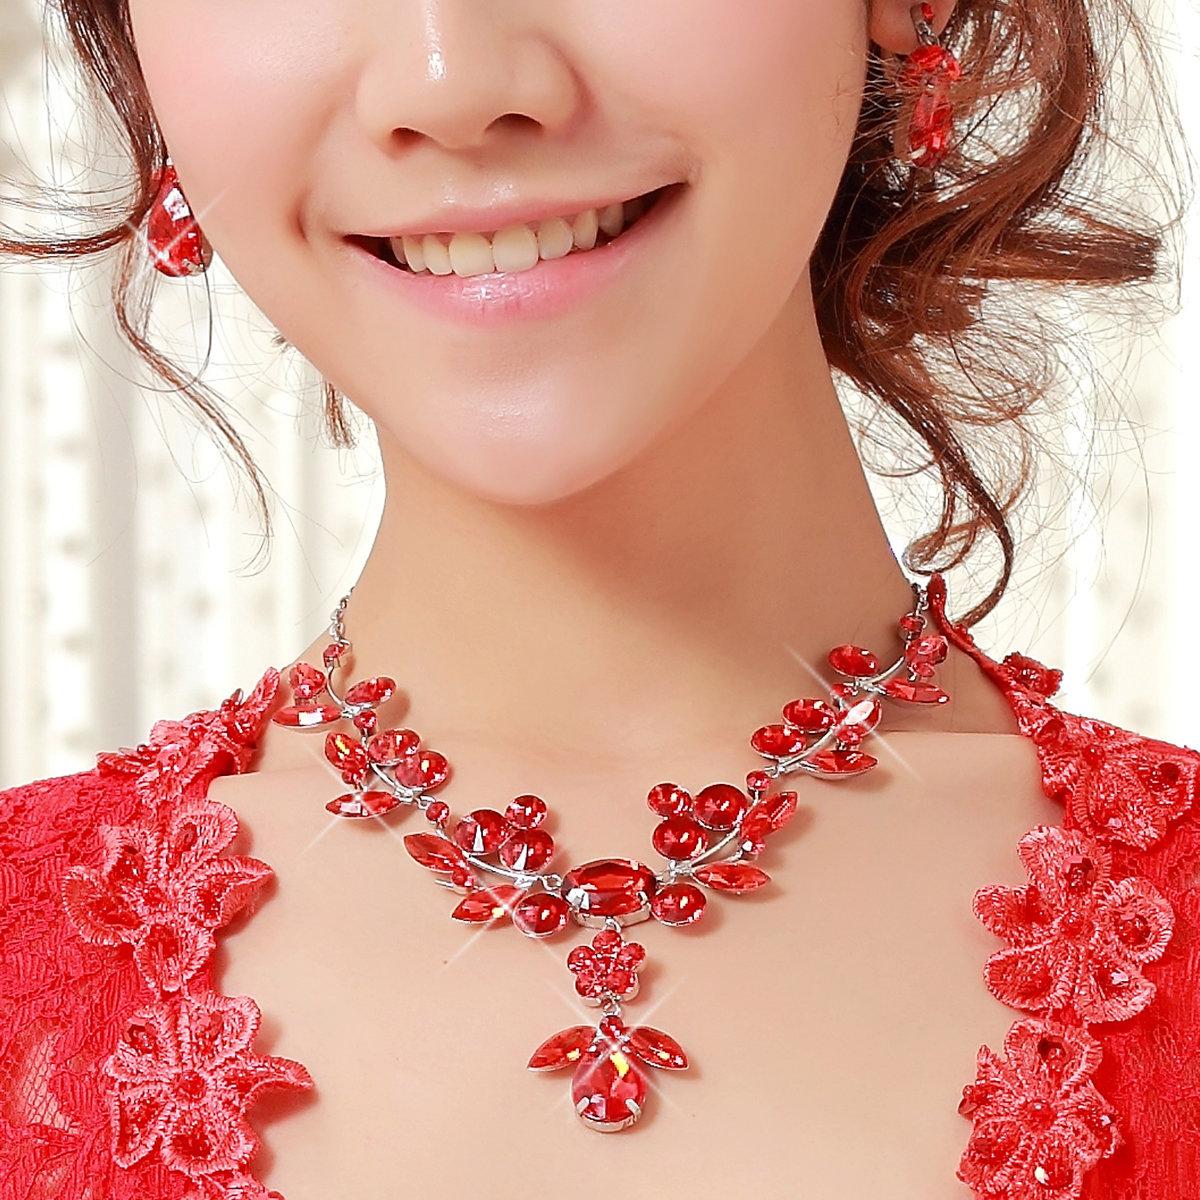 Картинка с ожерельем